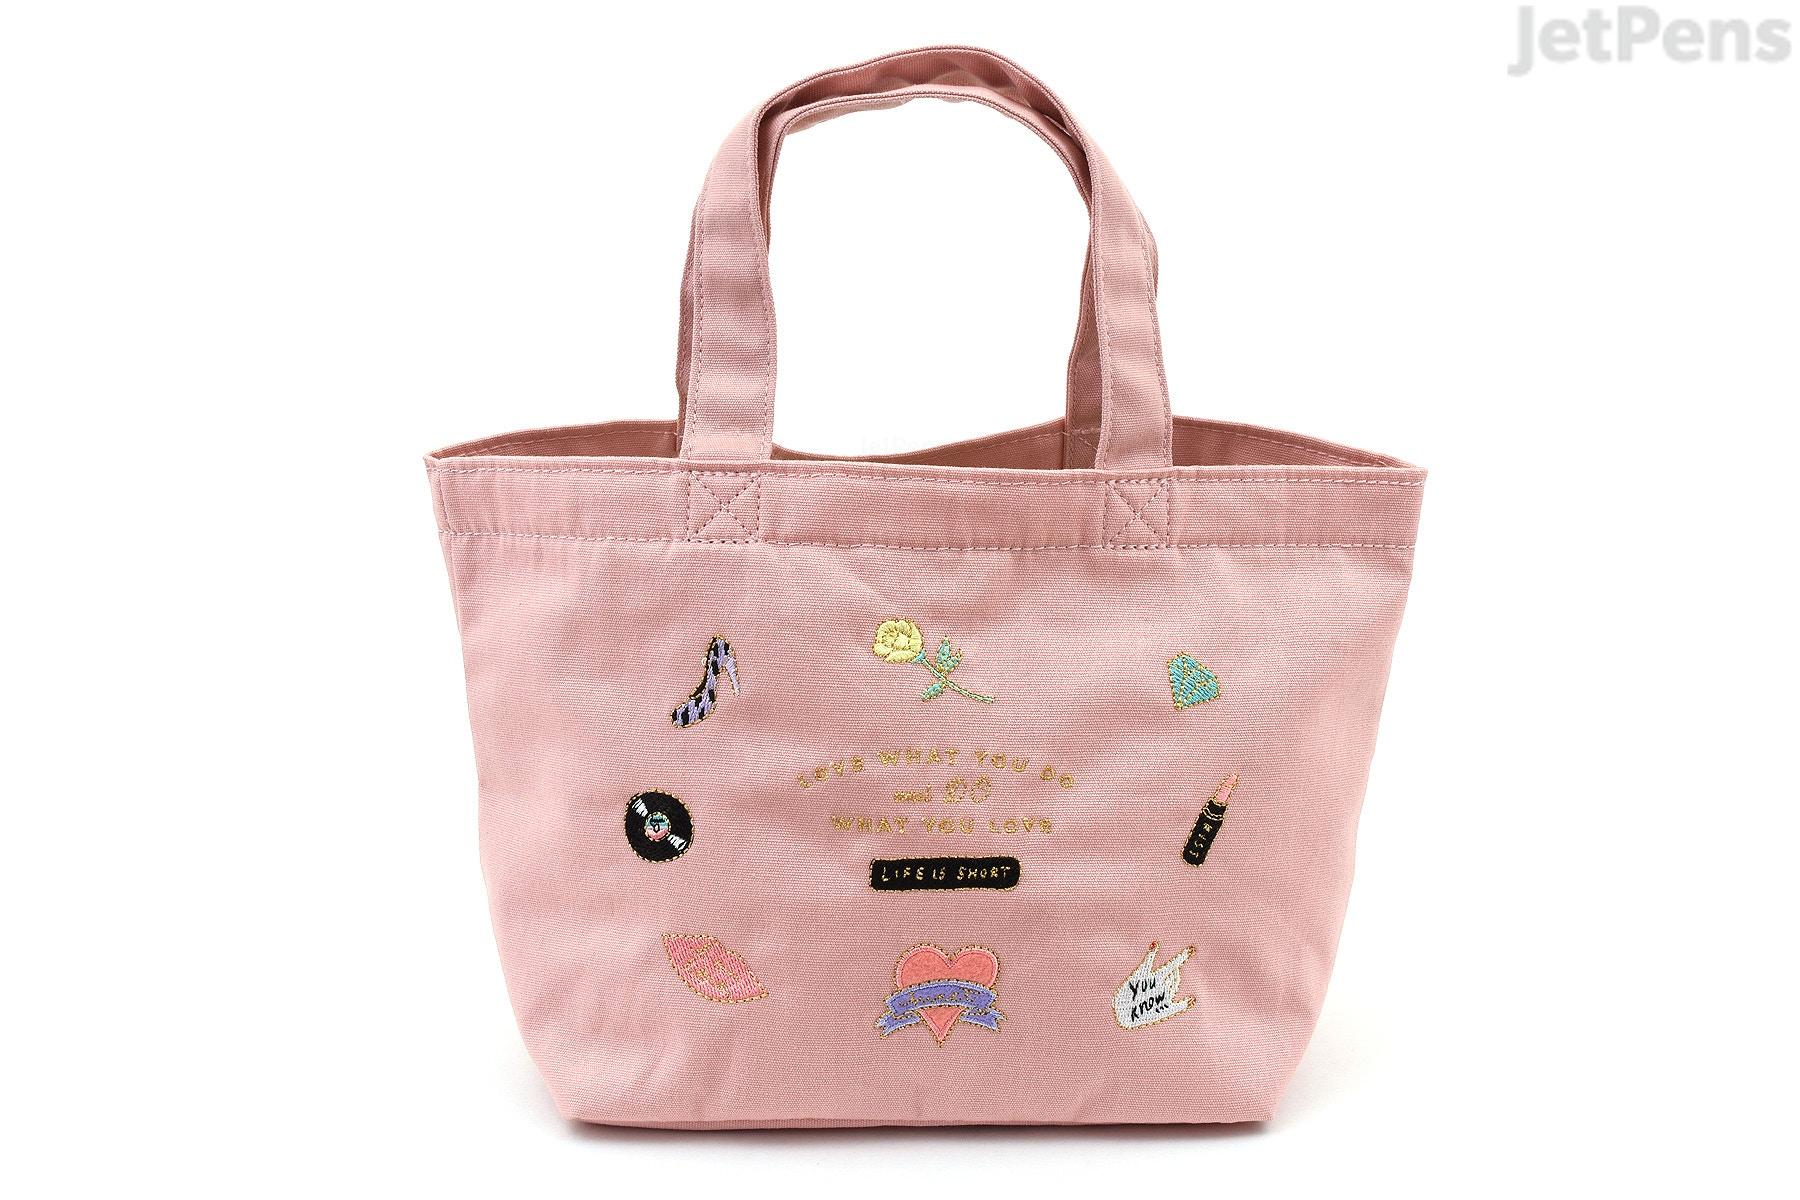 Mark\'s Zakka Collection Mini Tote - Icon Embroidery - Pink - JetPens.com